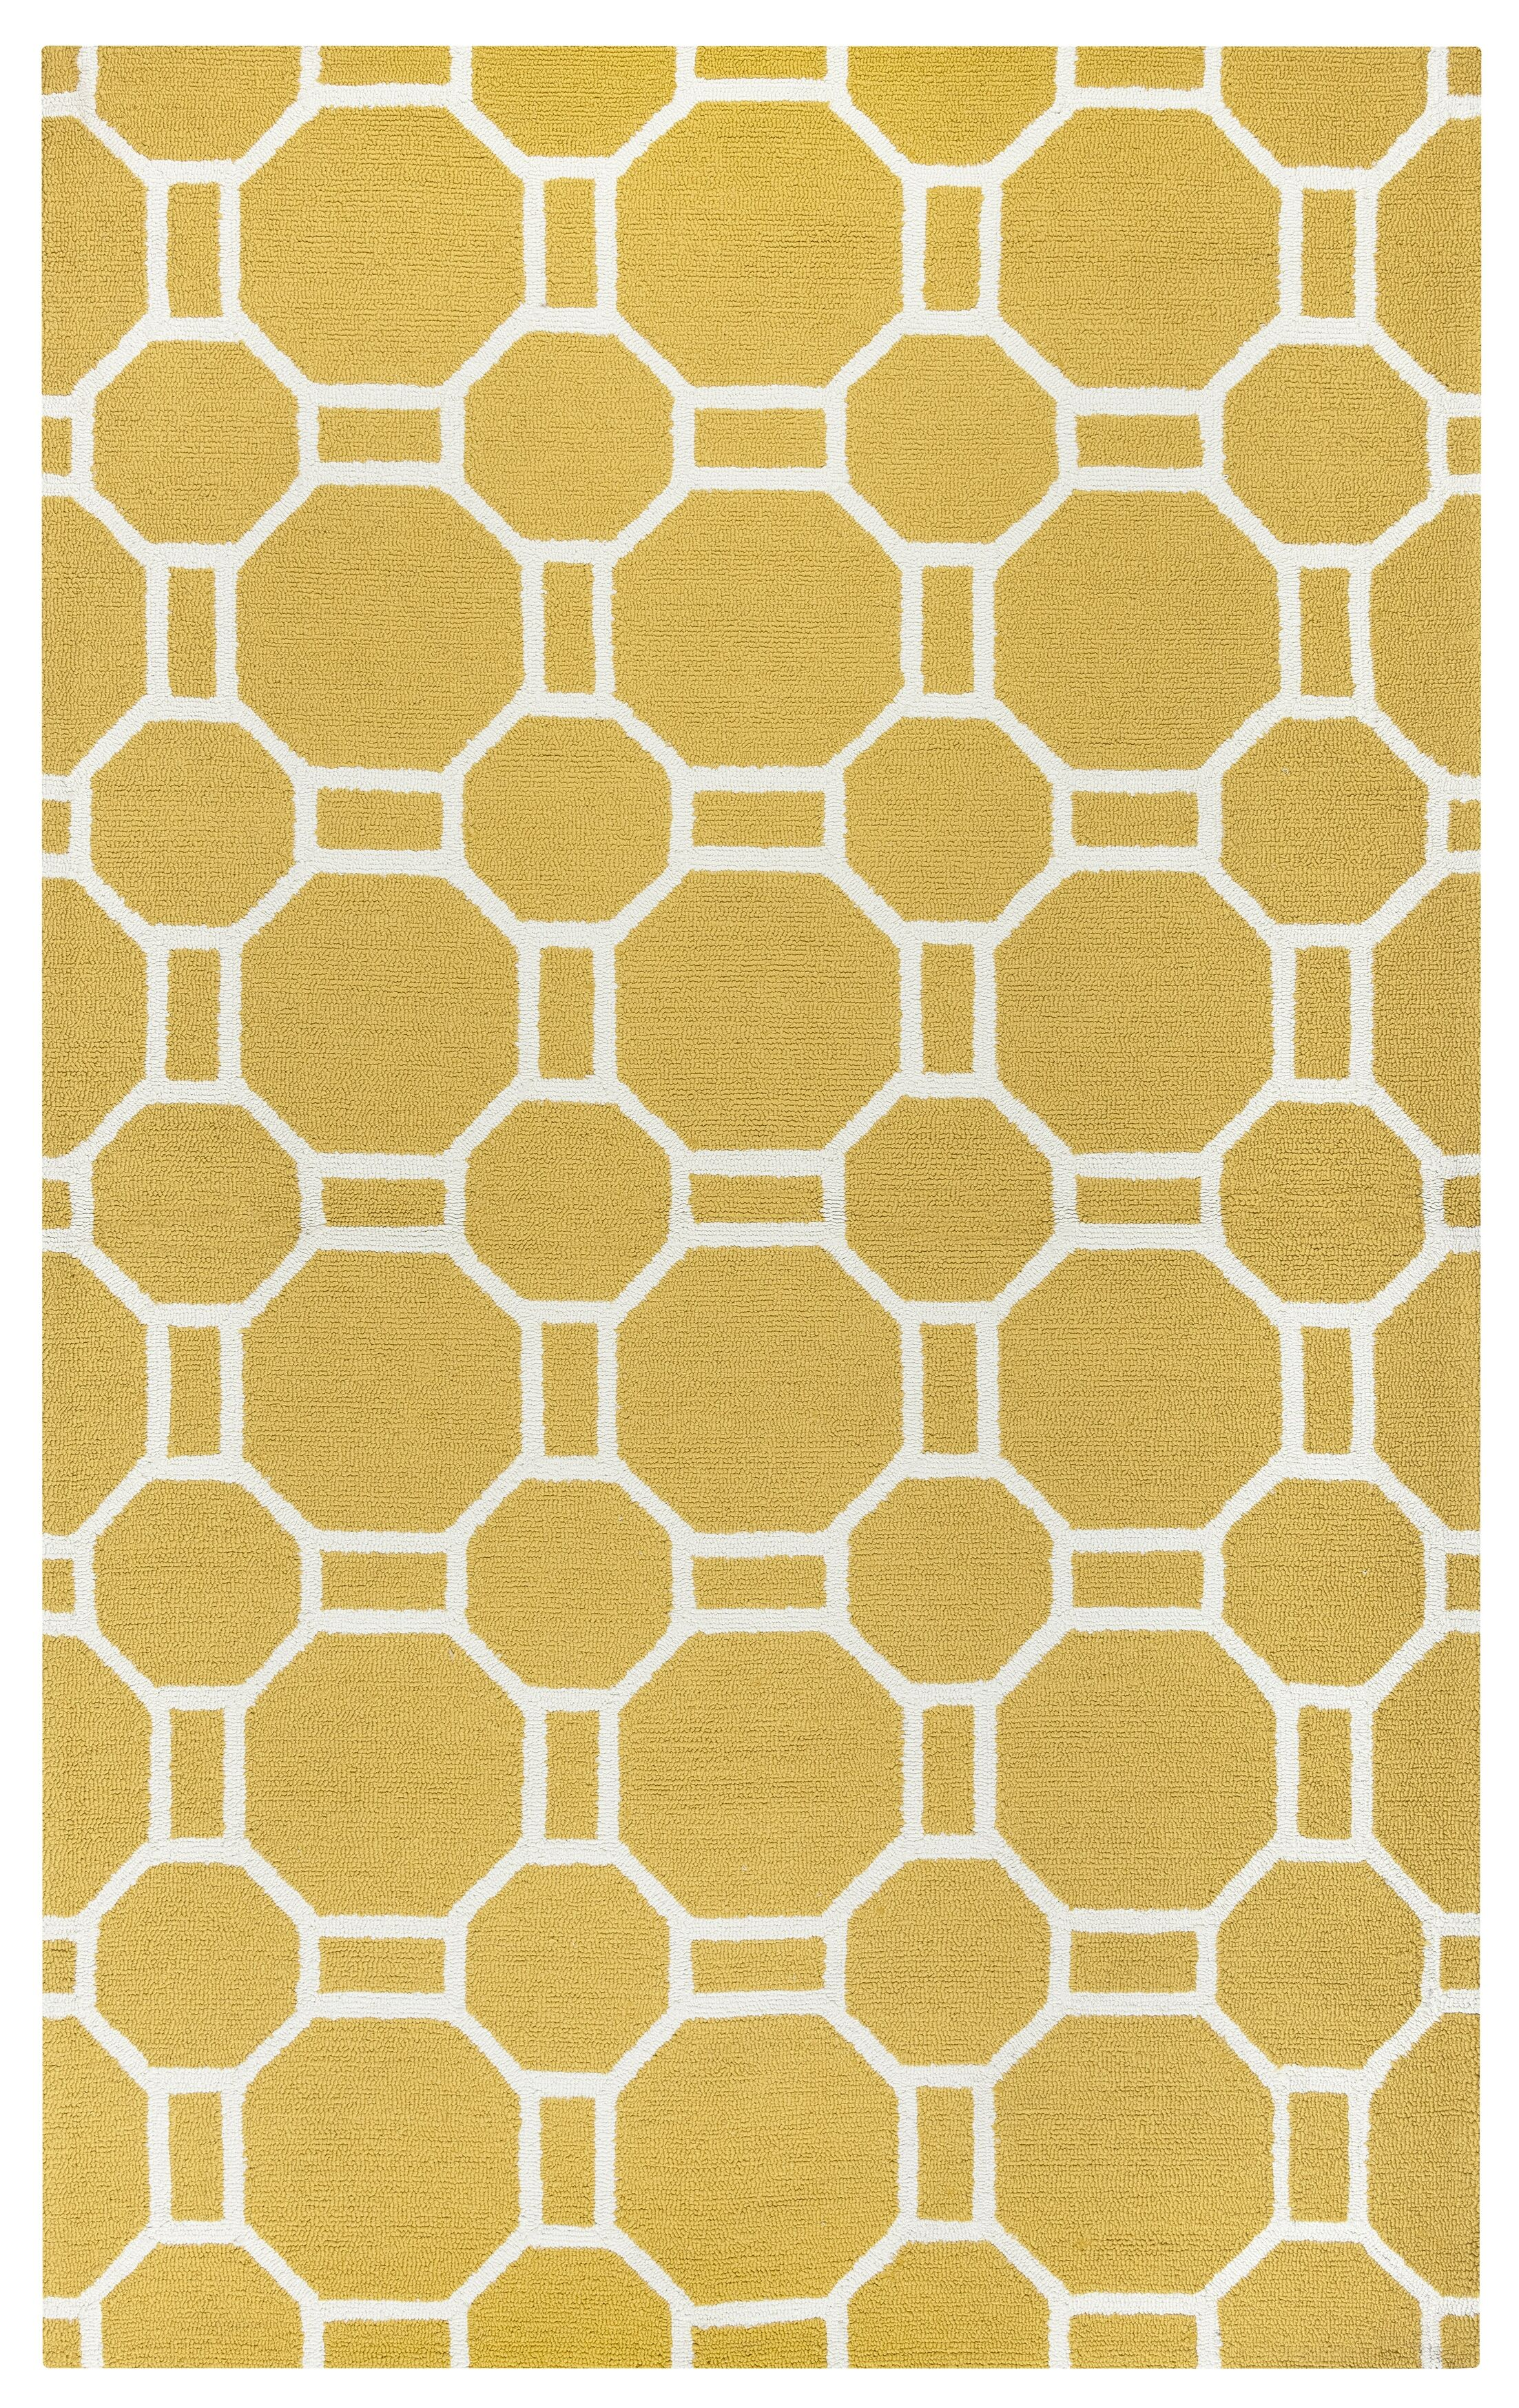 Evangeline Hand-Tufted Gold Indoor/Outdoor Area Rug Size: Rectangle 5' x 7'6